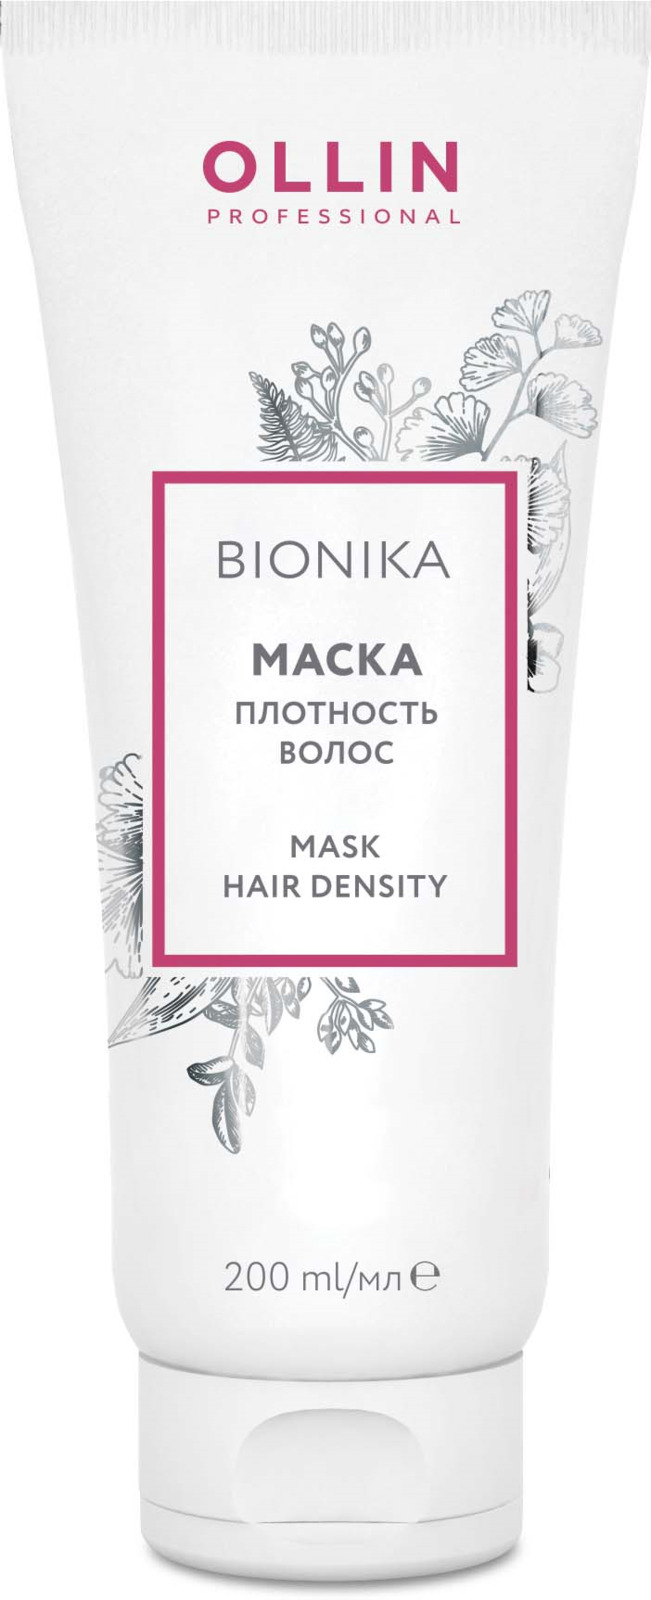 "Ollin Маска ""Плотность волос"" BioNika Mask Hair Density 200 мл"